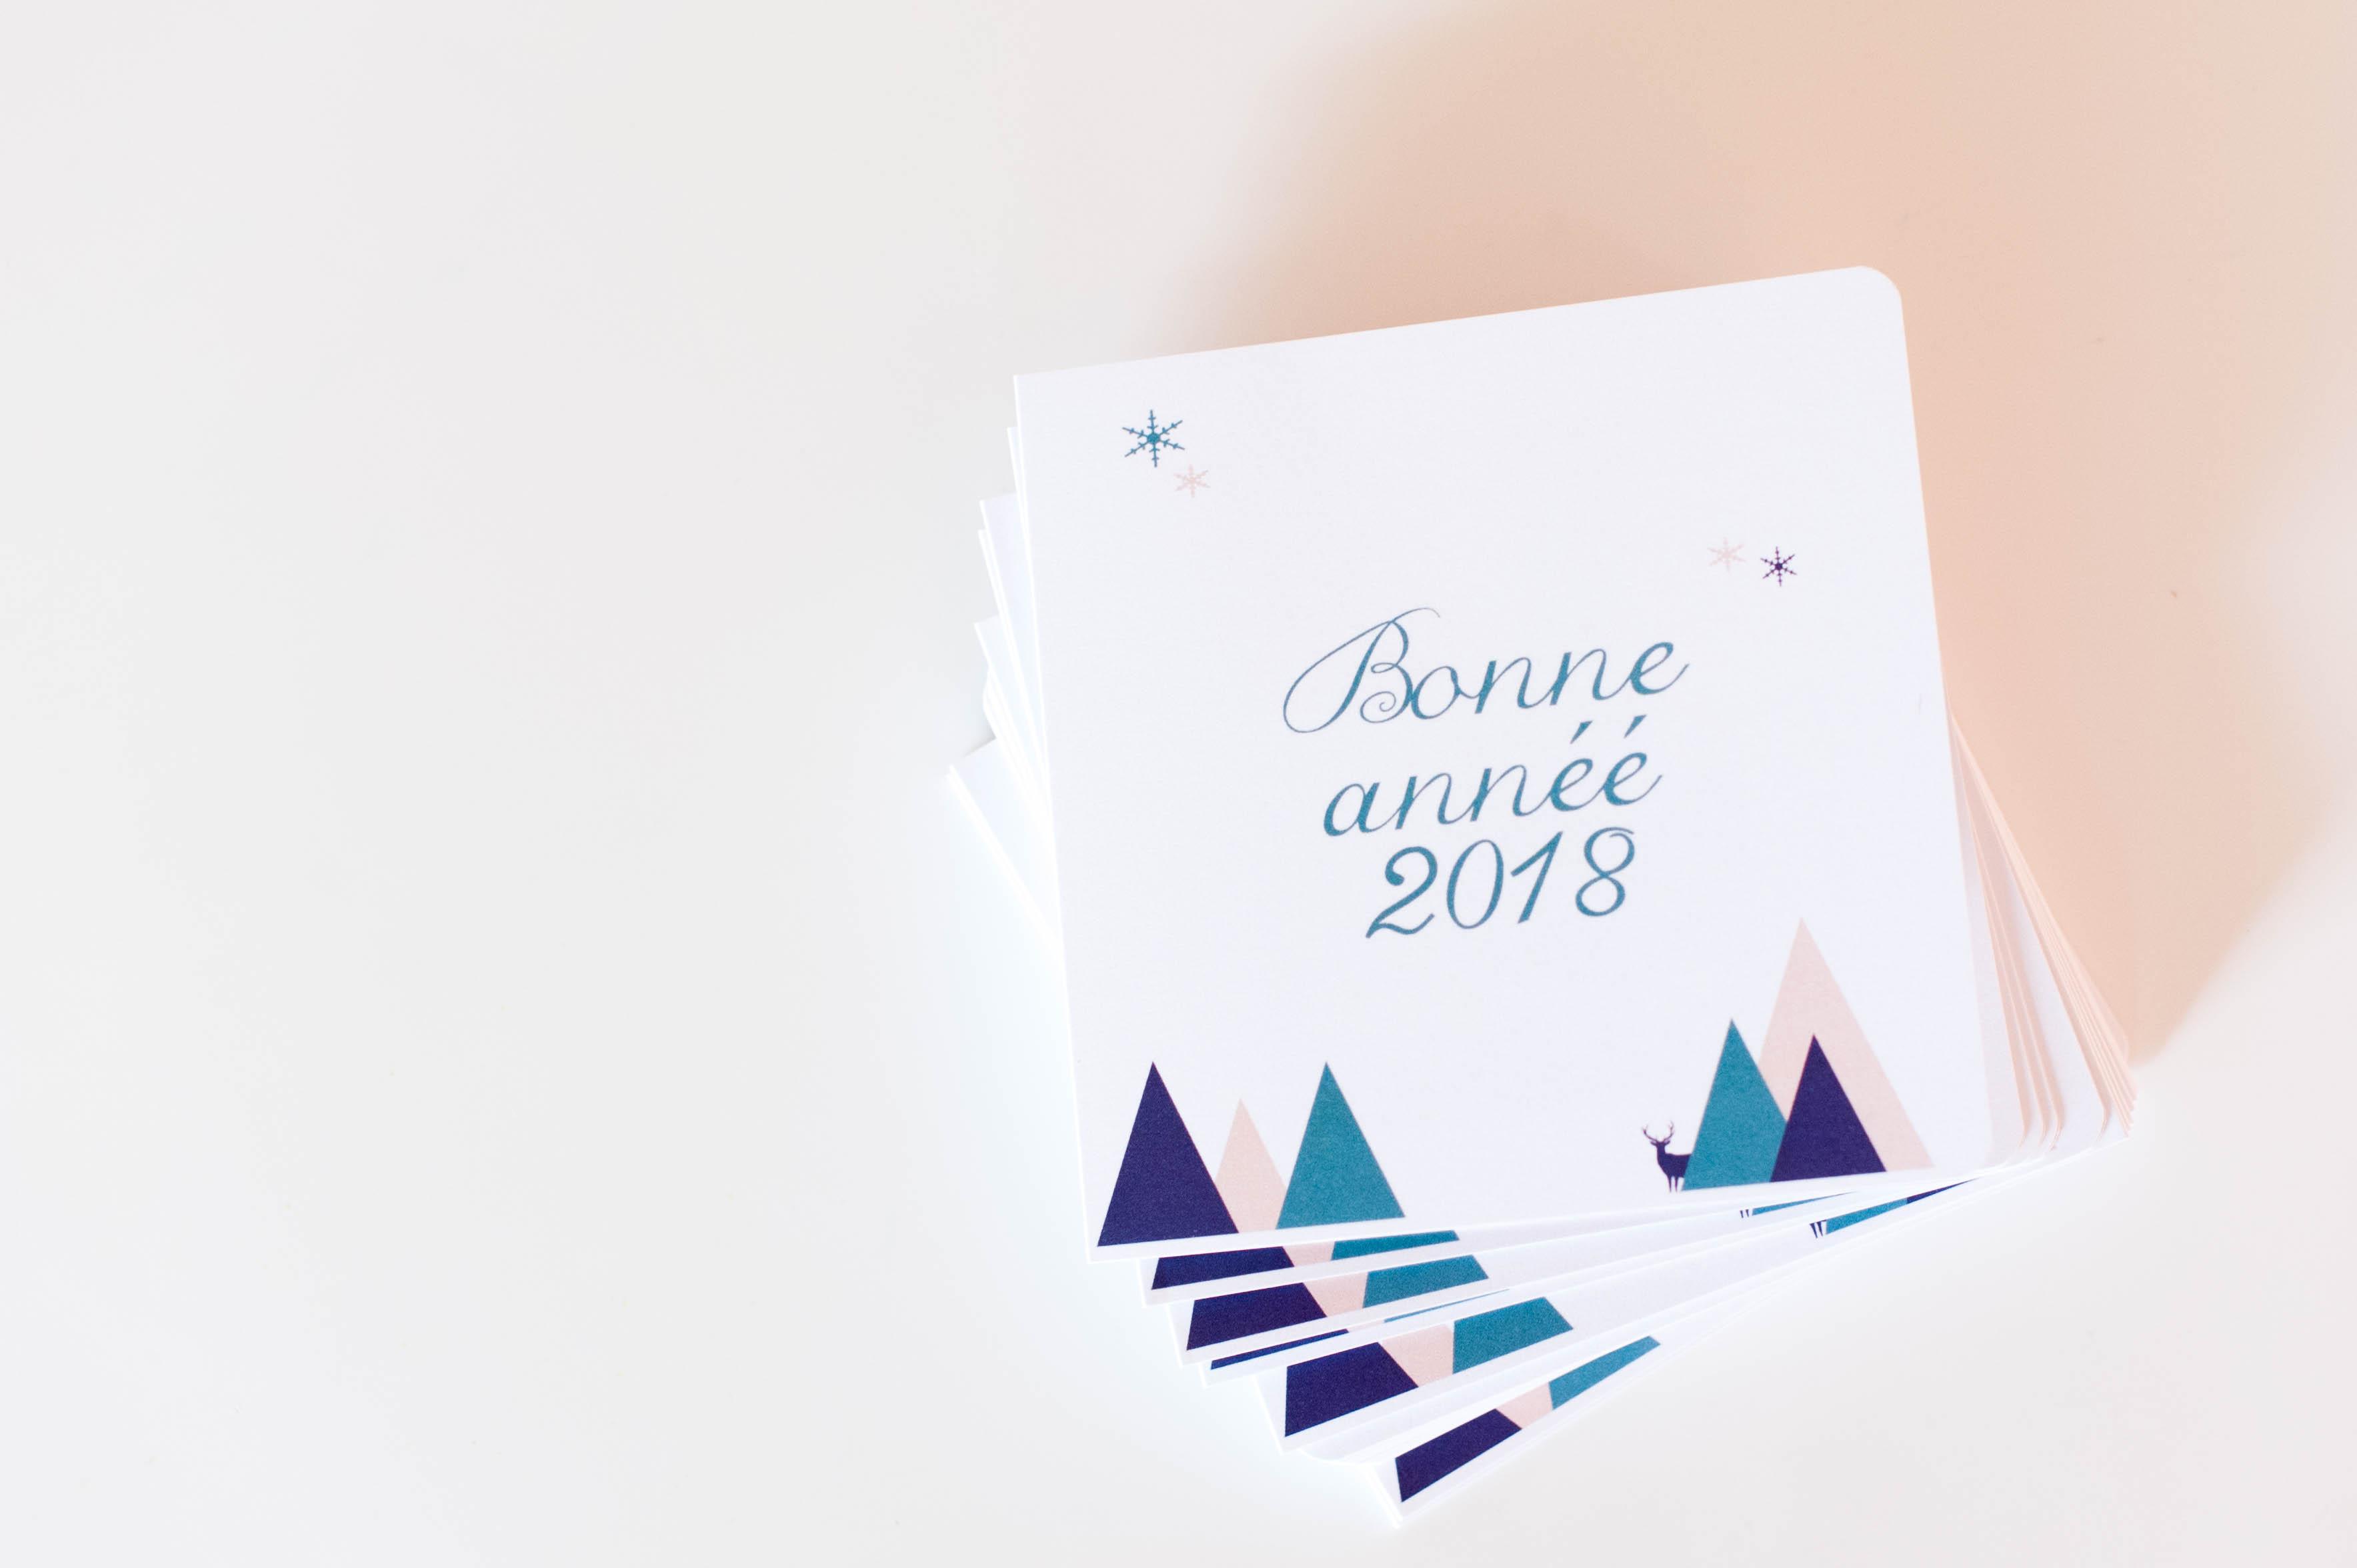 Nos cartes de voeux 2018